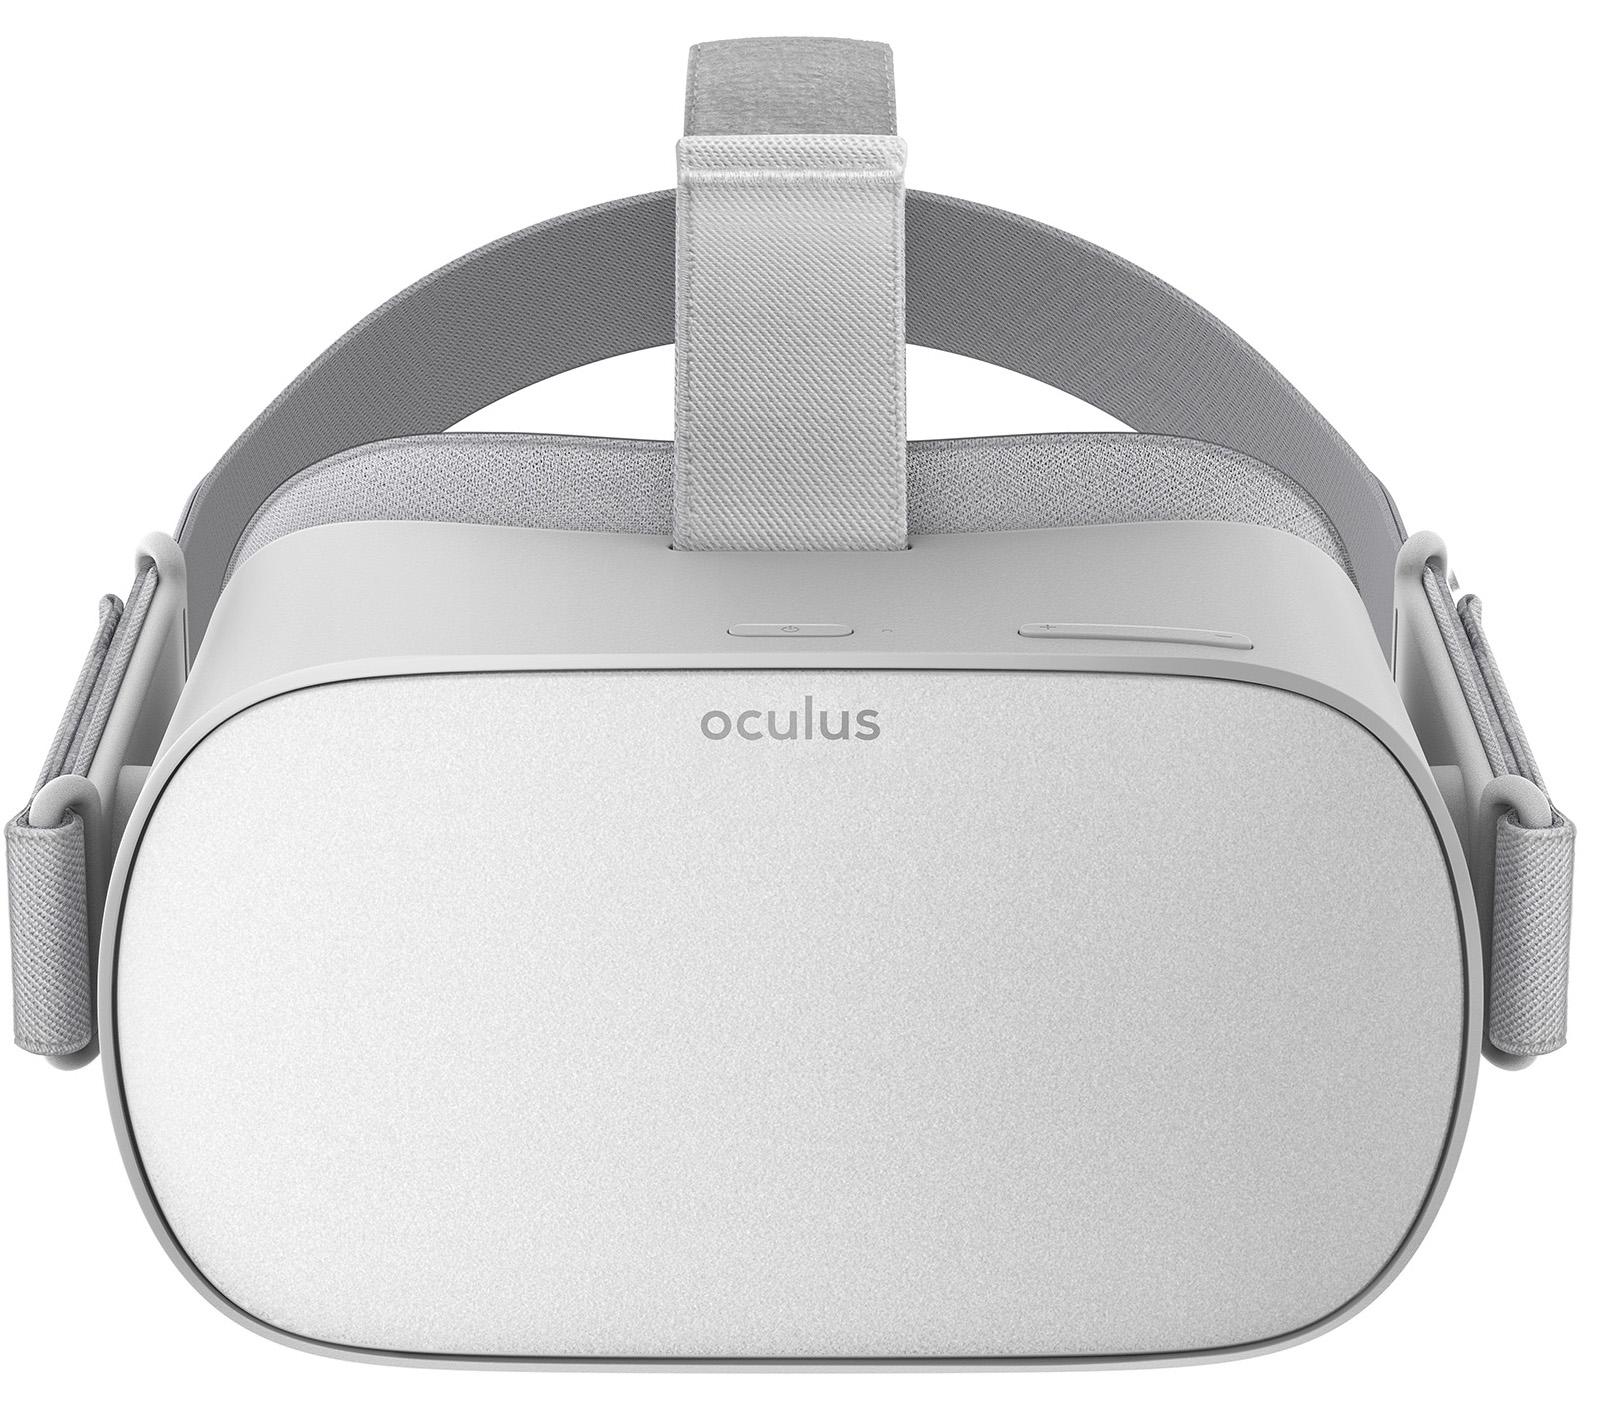 Oculus Go VR headset - £180 standalone headset.